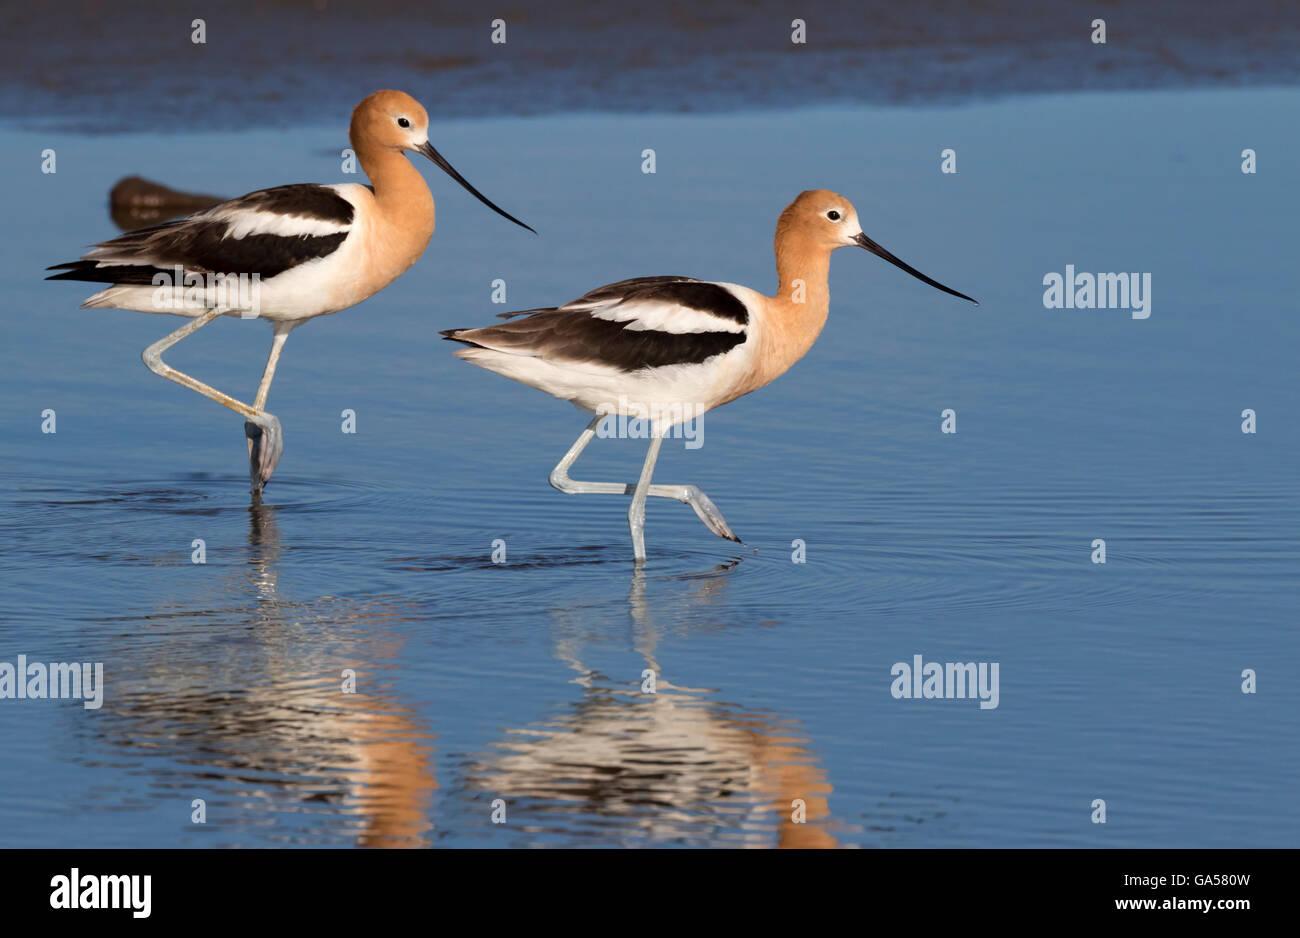 American avocets (Recurvirostra americana) wading in the tidal marsh, Galveston, Texas, USA - Stock Image